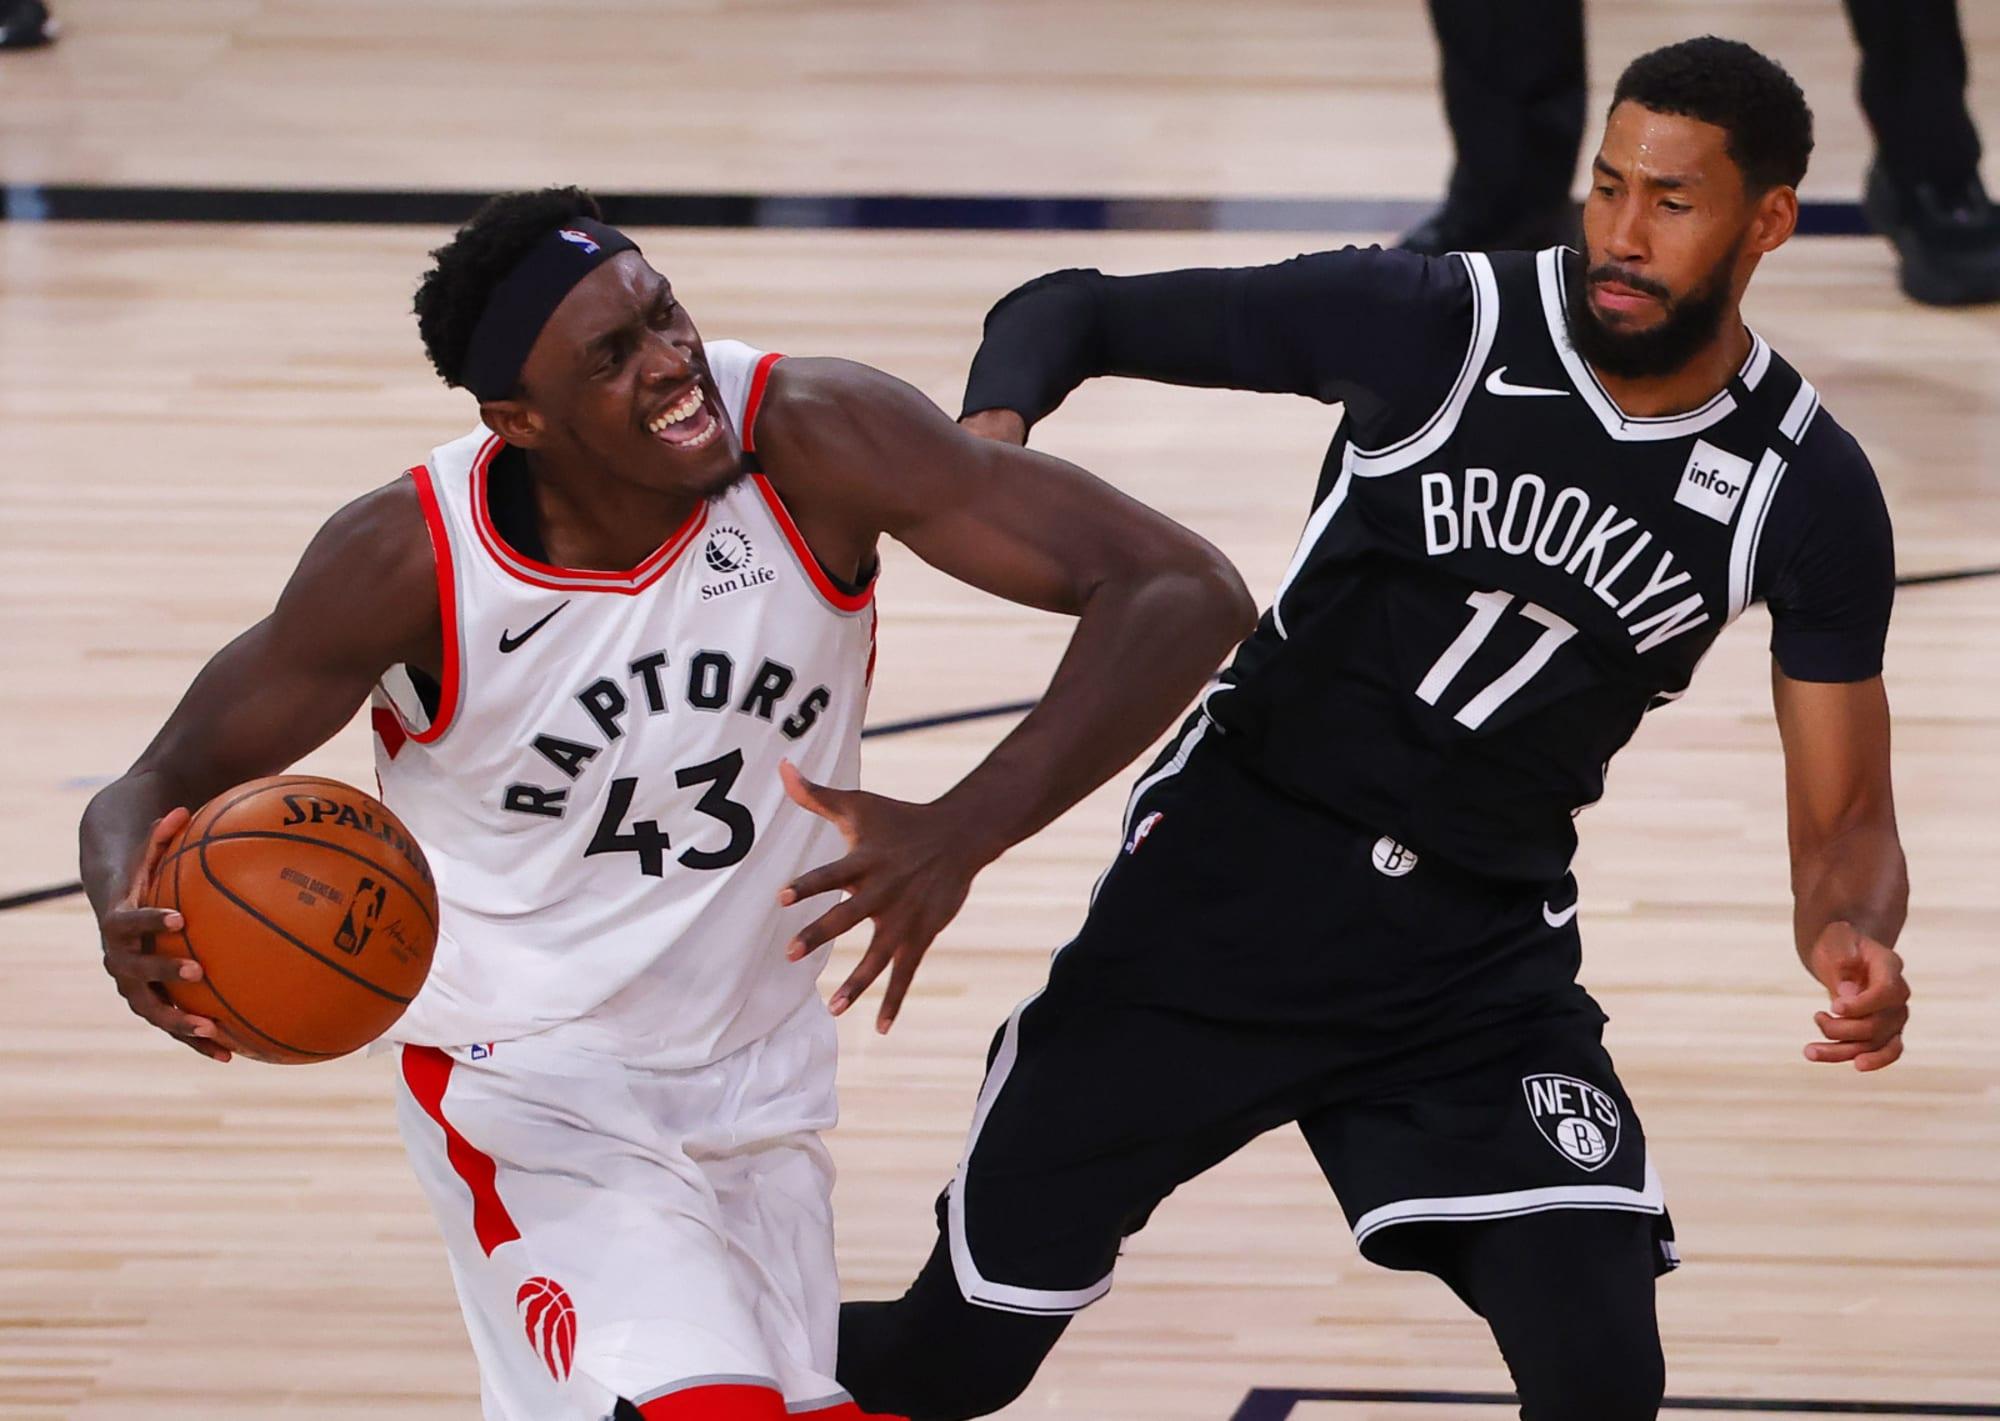 Toronto Raptors: Siakam's Struggle Is Bigger Than Basketball